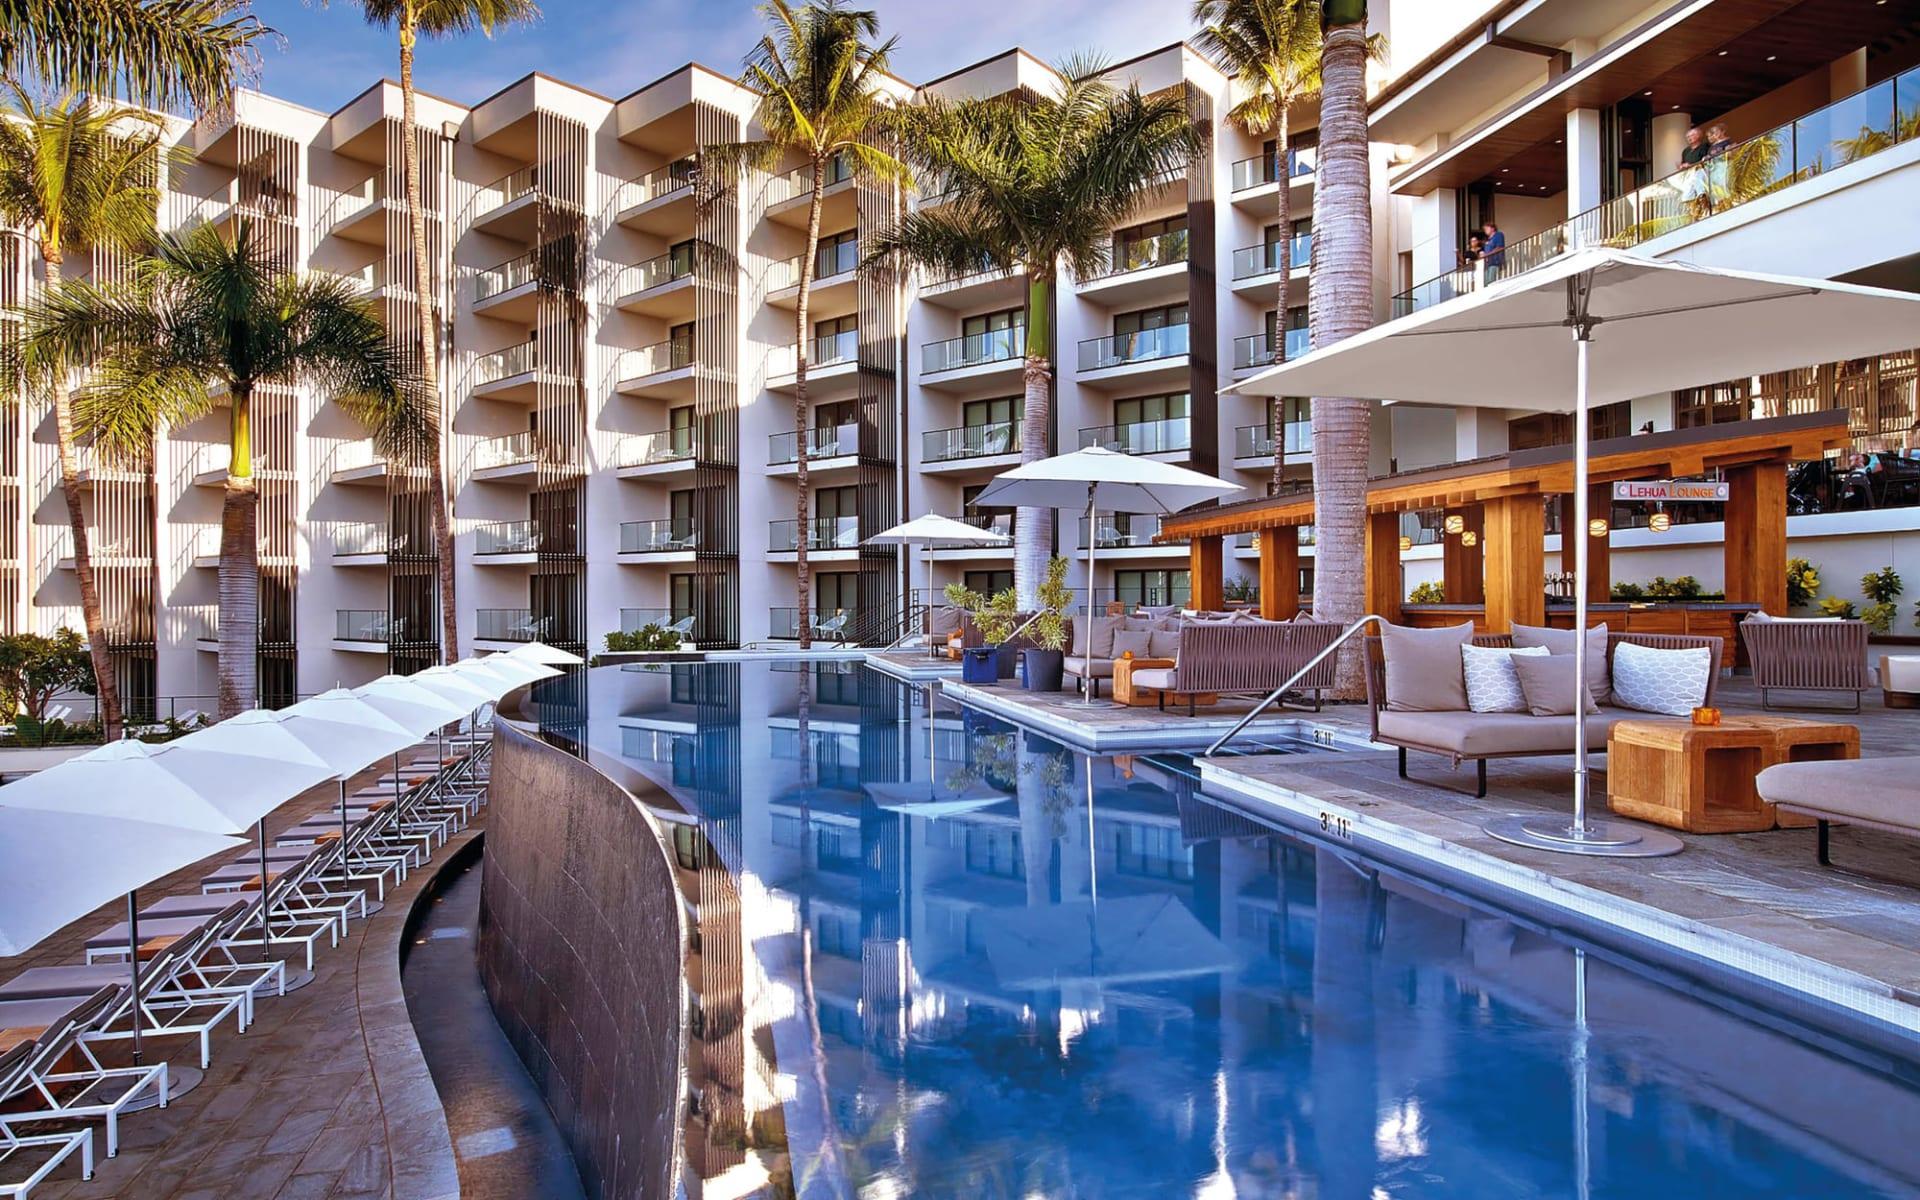 Andaz Maui at Wailea Resort in Wailea - Maui: Andaz Maui at Wailea Resort - Aussenpool